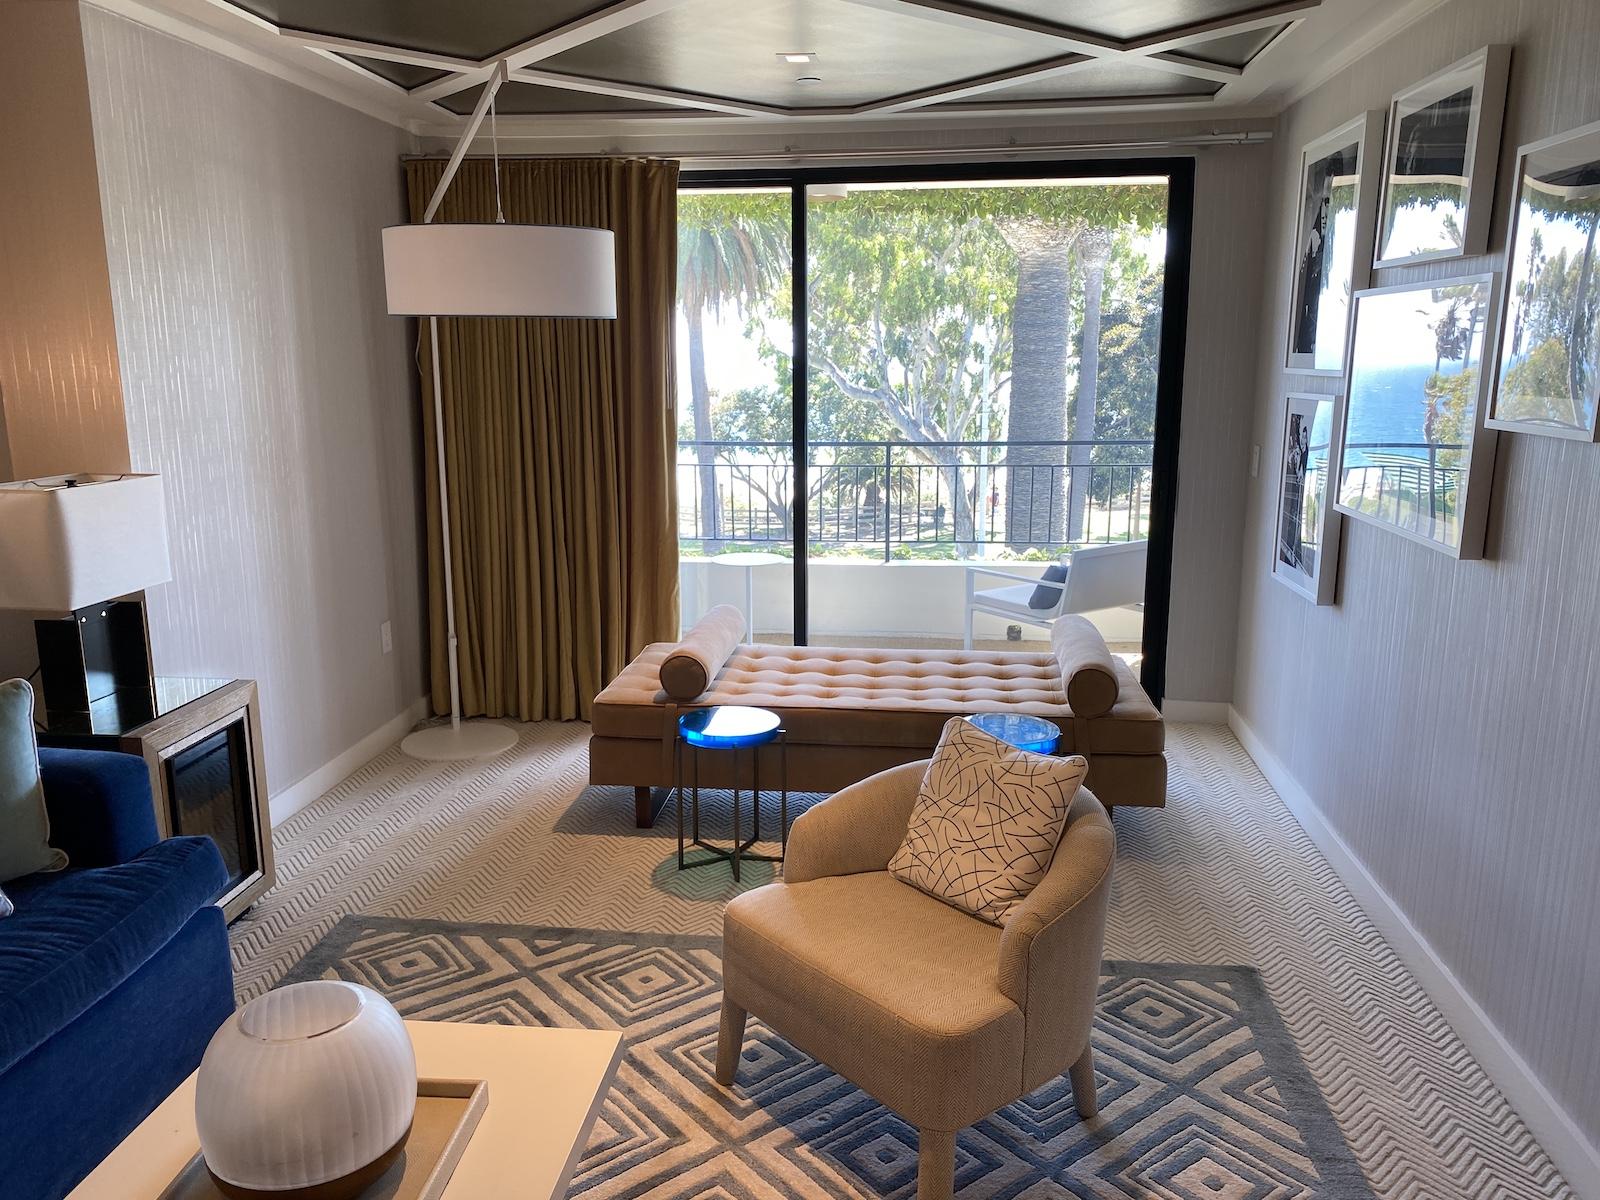 Oceana Santa Monica livuing room